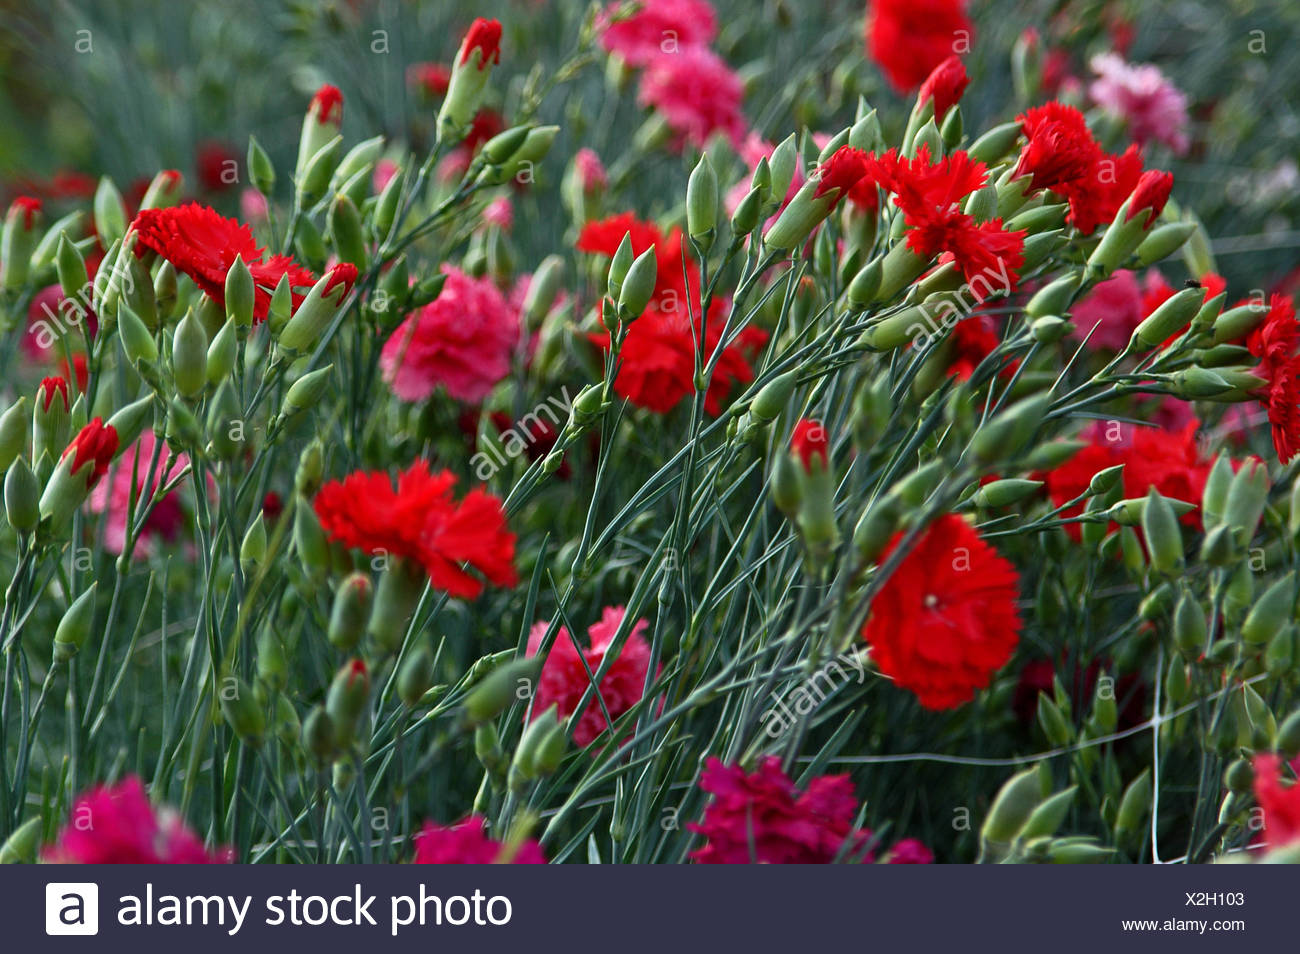 flower plant green carnation bloom blossom flourish flourishing coloured - Stock Image